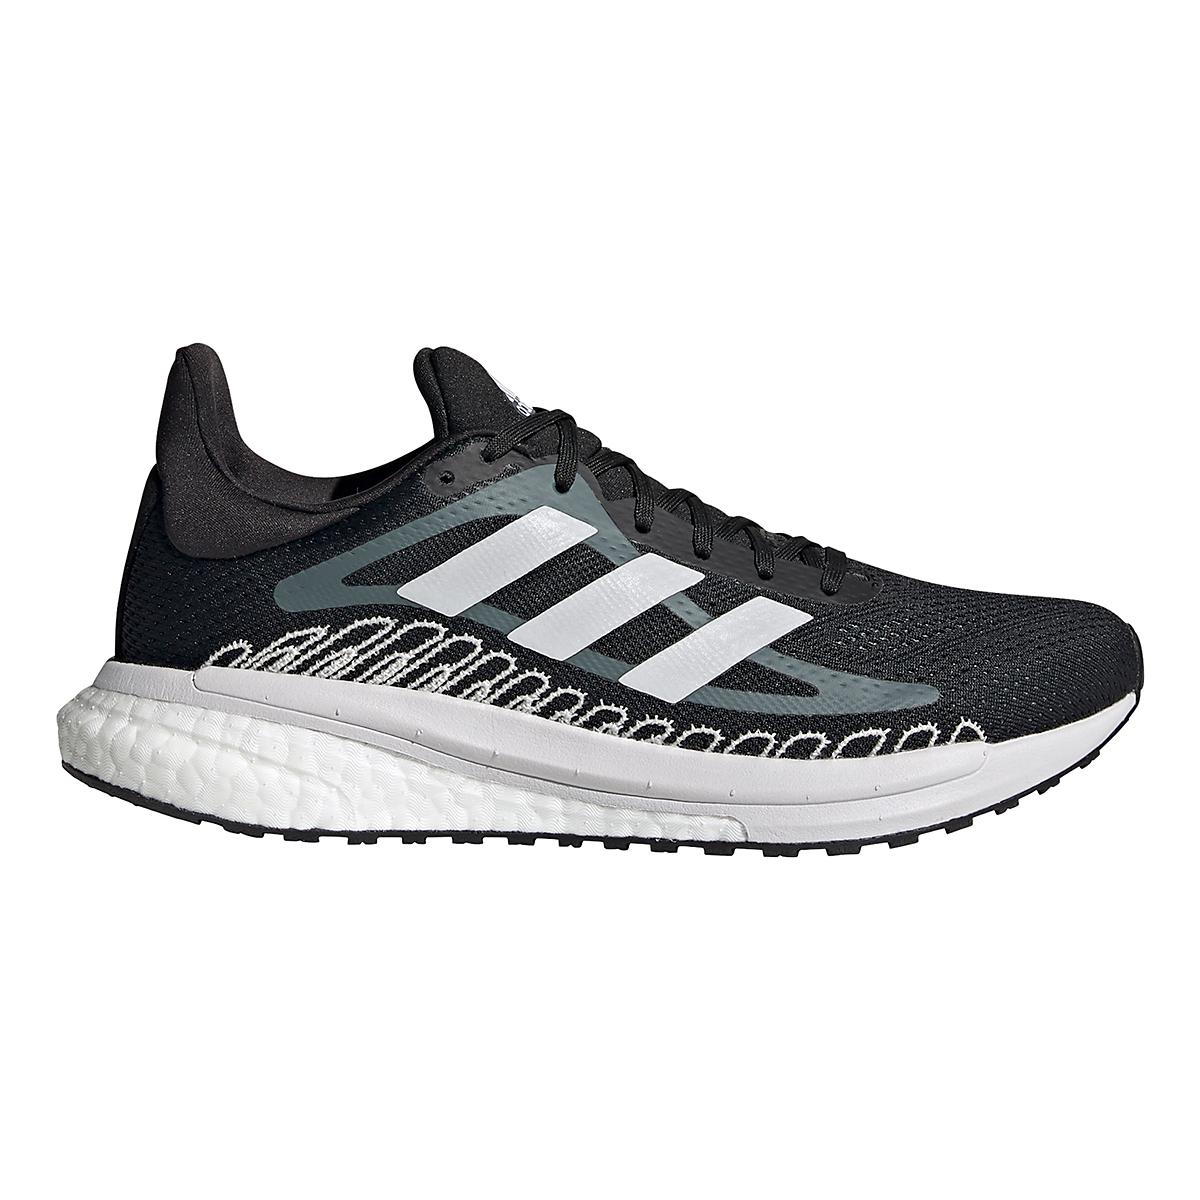 Women's Adidas Solar Glide ST 3 Running Shoe - Color: Core Black - Size: 5 - Width: Regular, Core Black, large, image 1